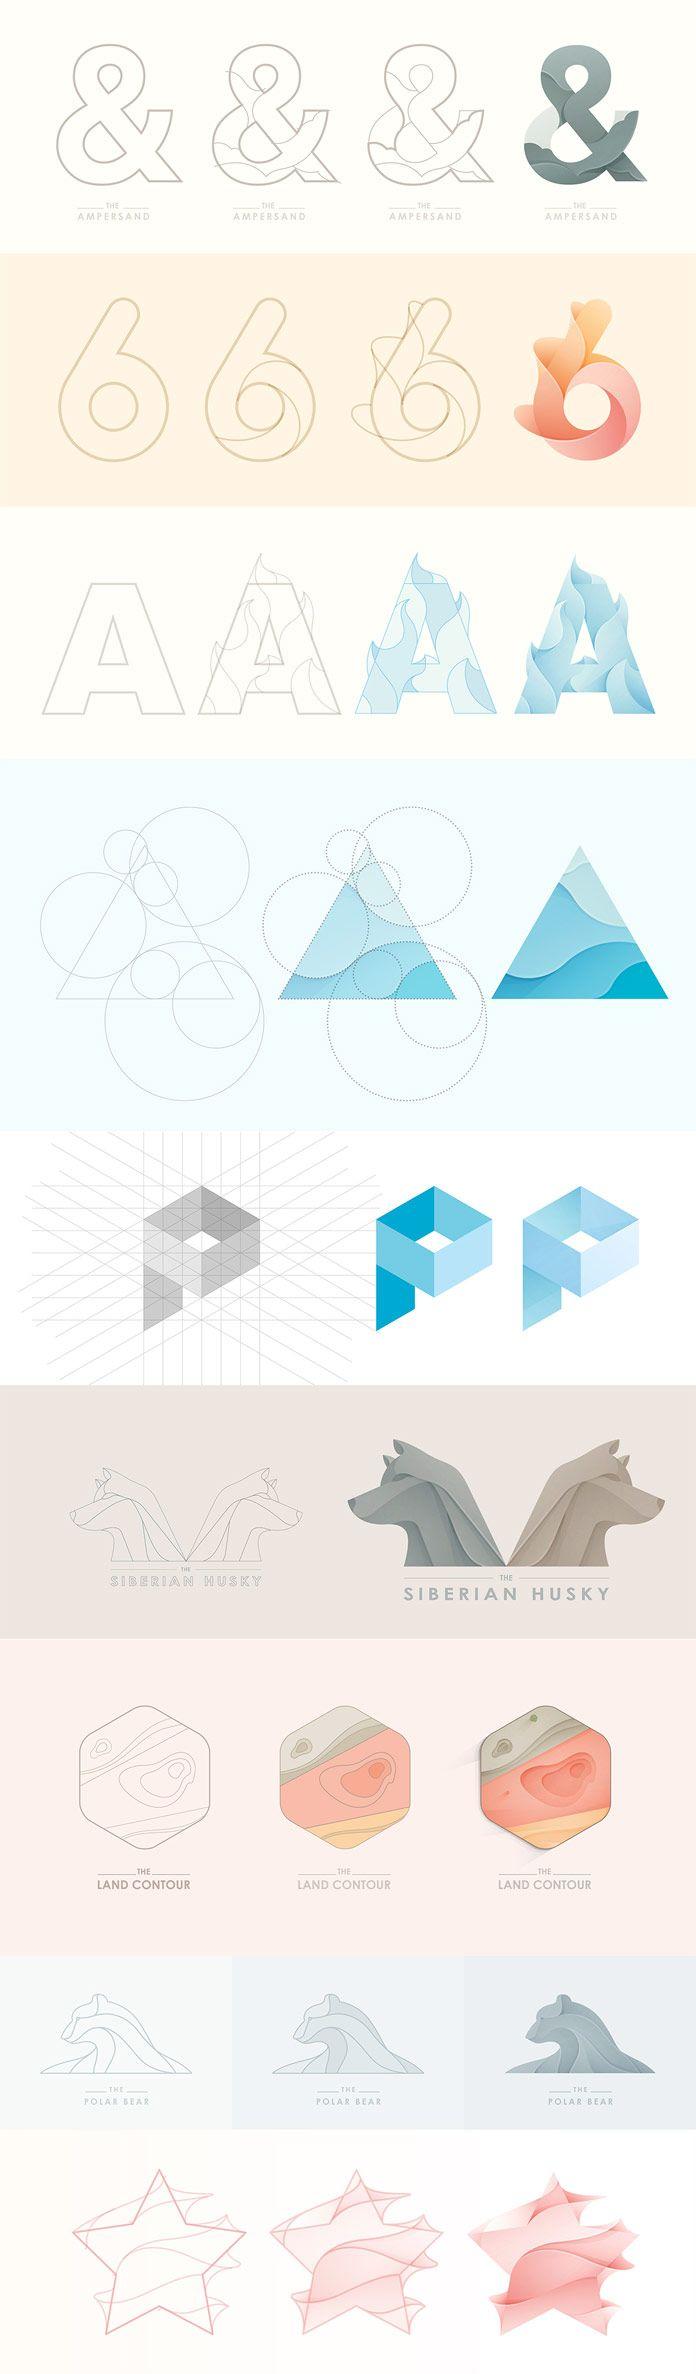 The nine principles of Process Design